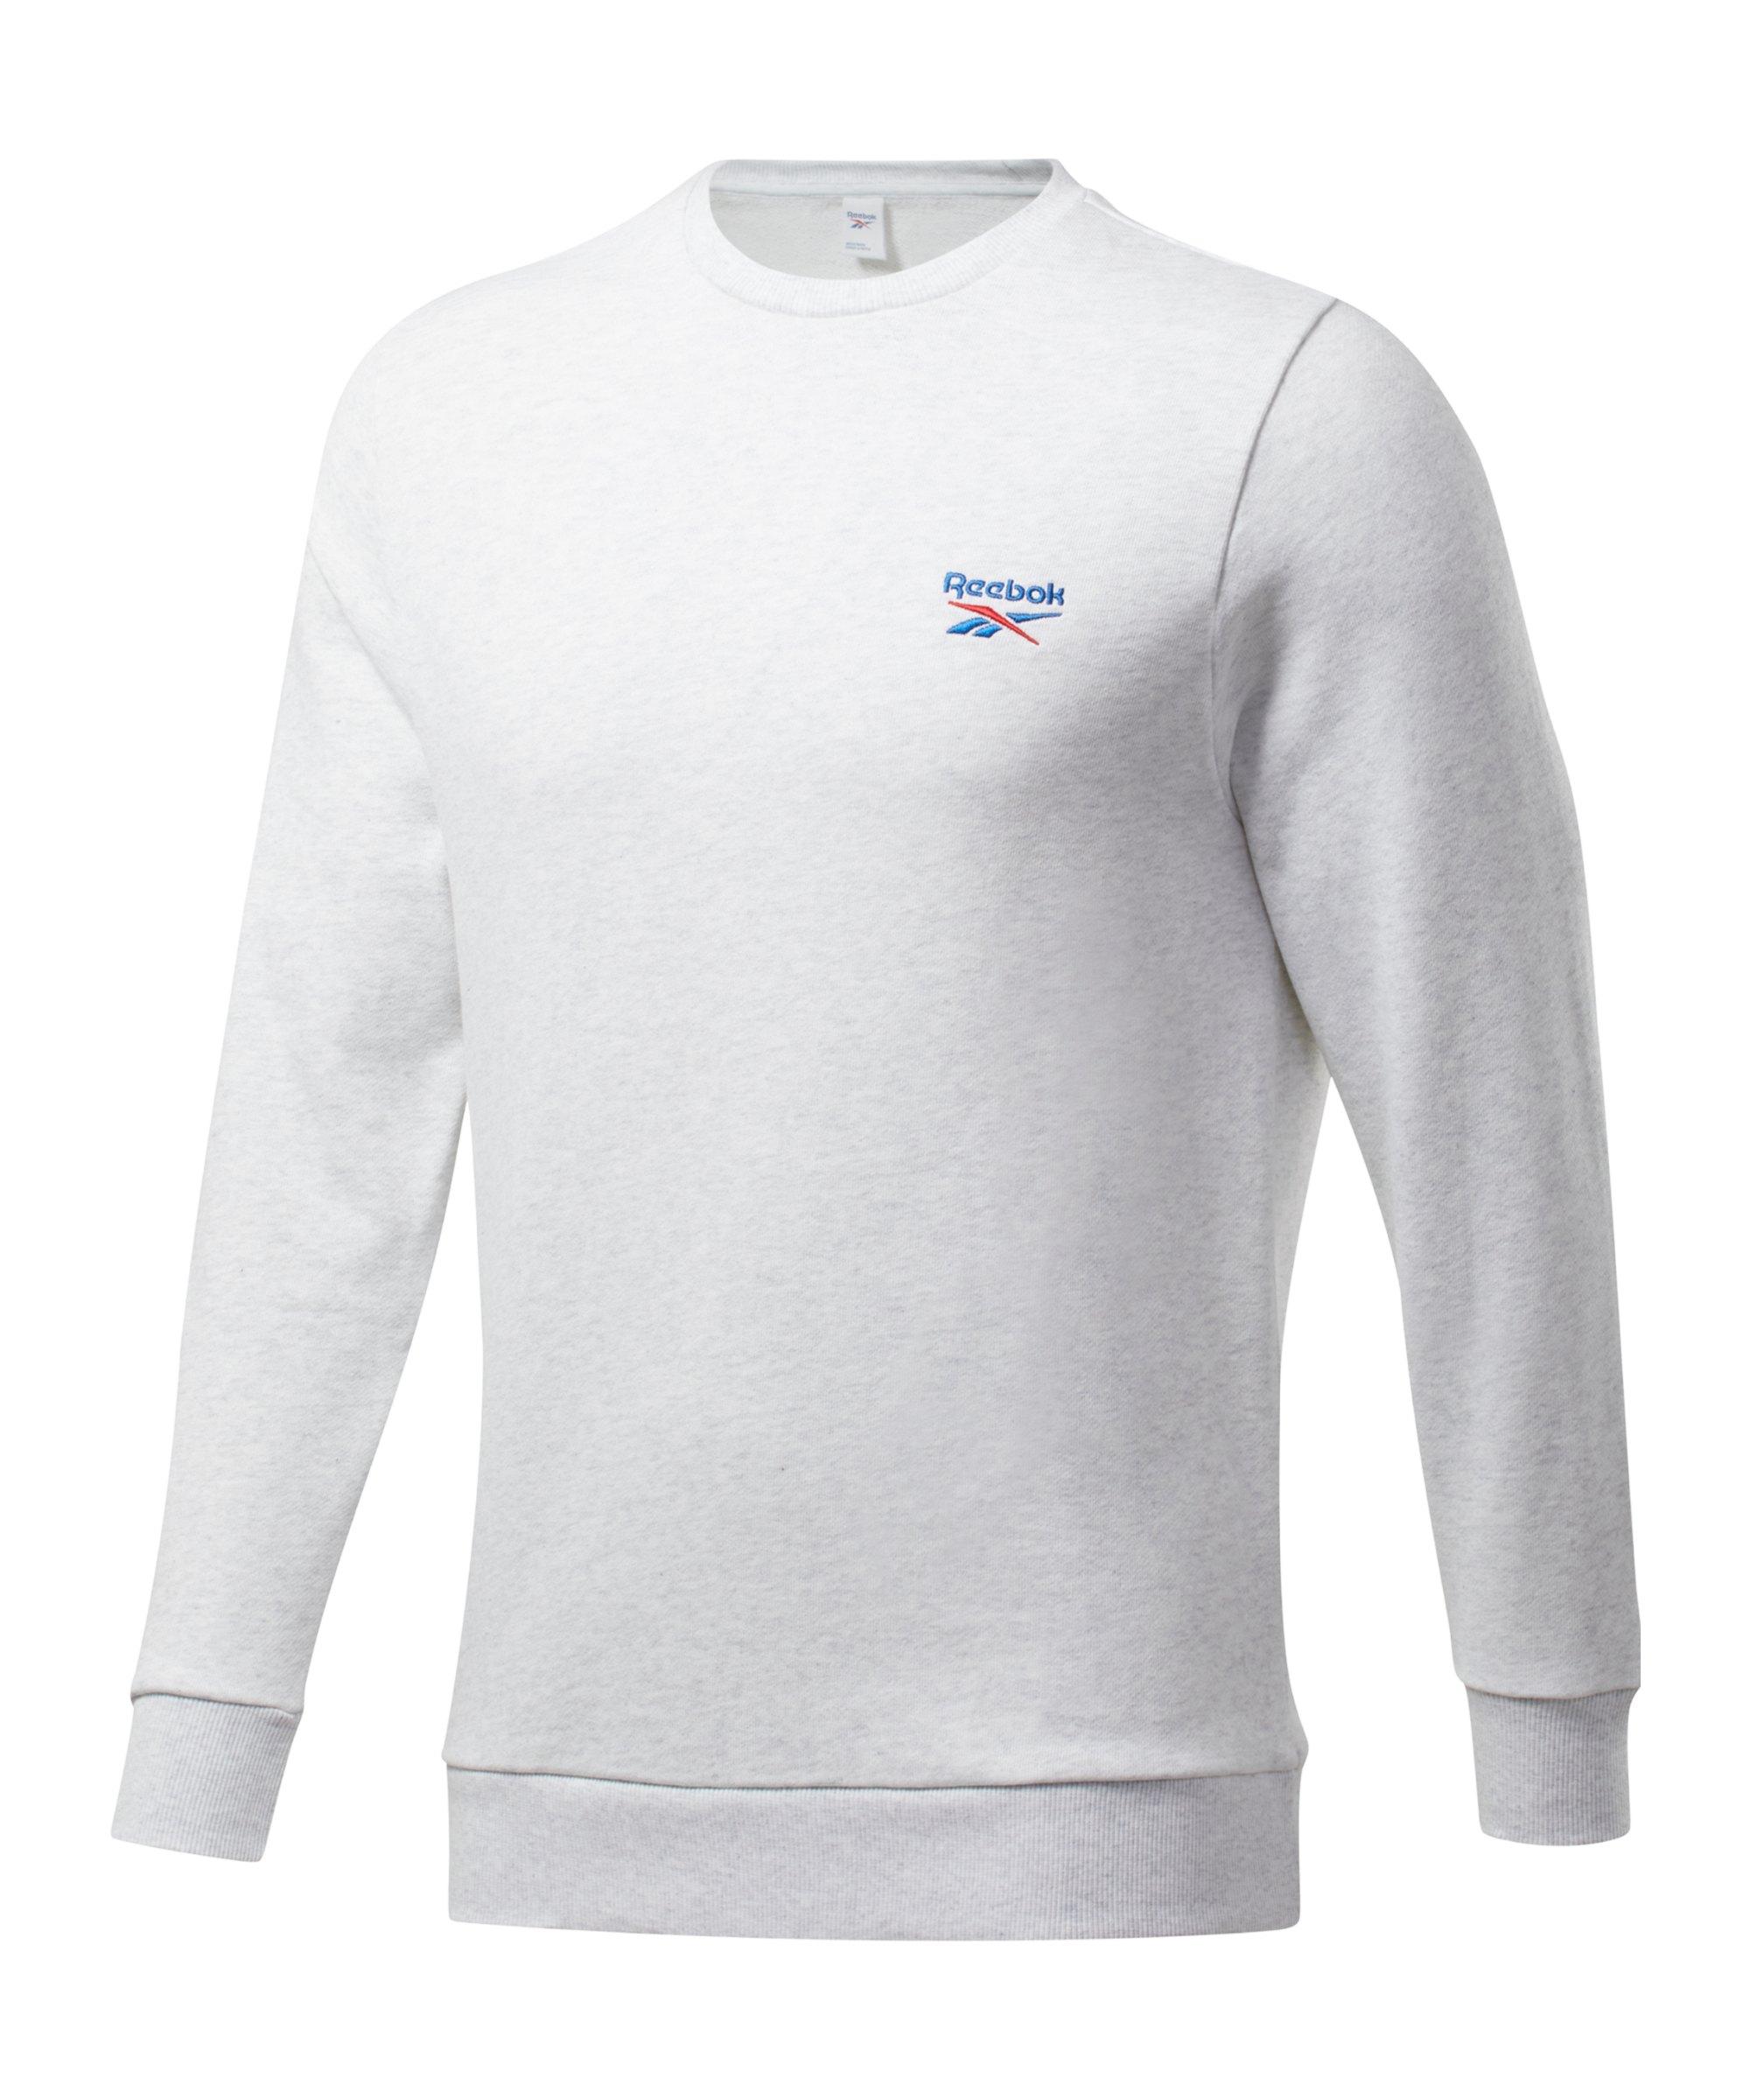 Reebok CL Small Vector Crew Sweatshirt Weiss - weiss